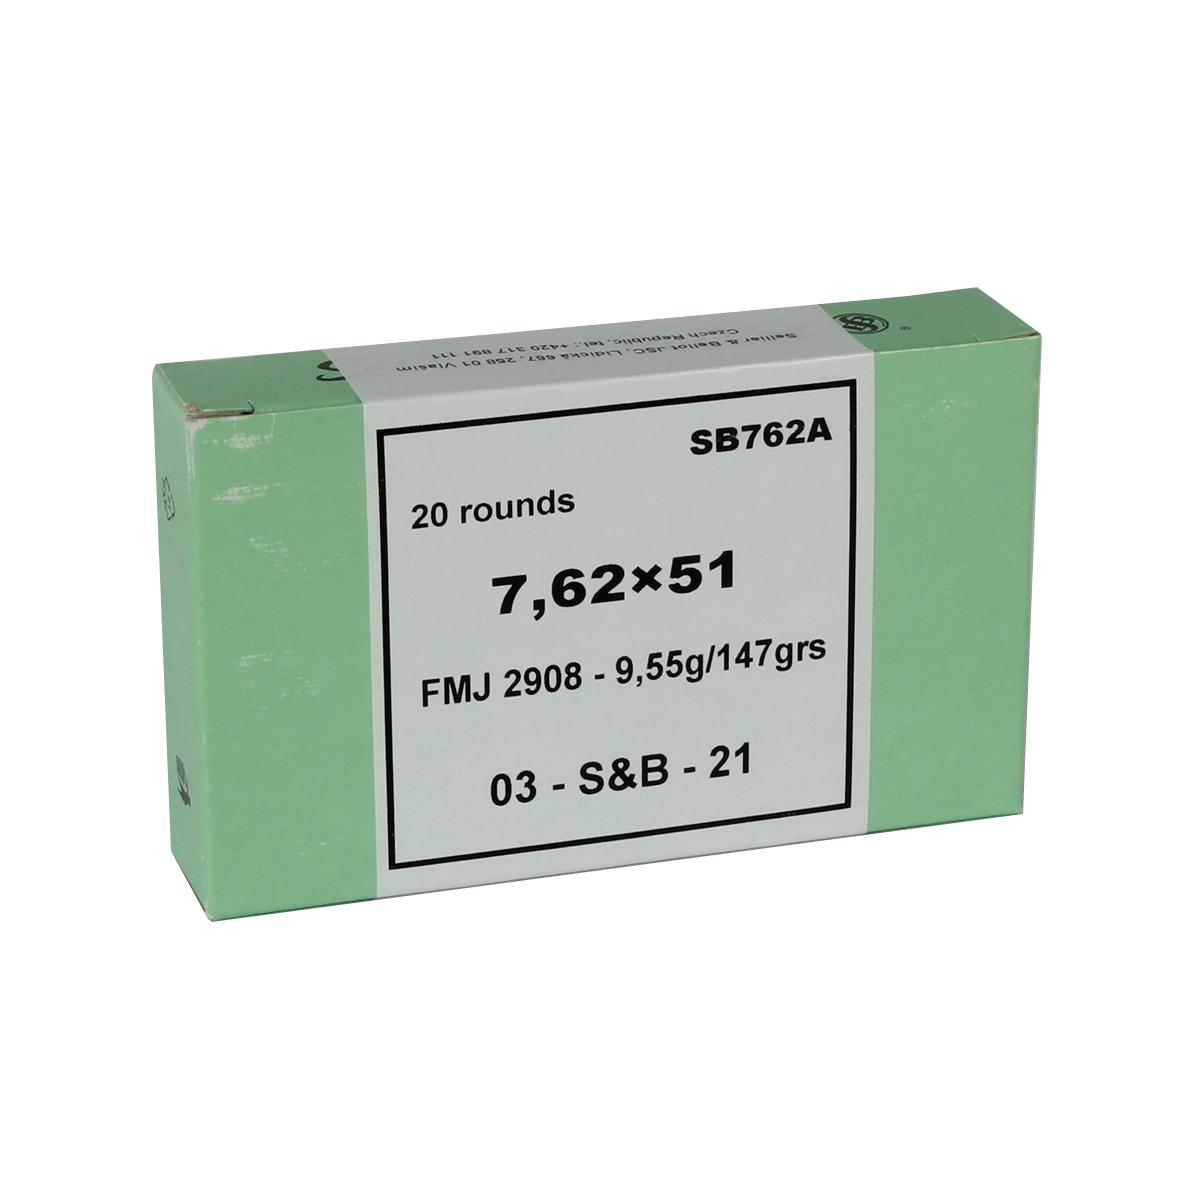 Sellier & Bellot 7.62x51mm 147 GR. FMJ - 20RD